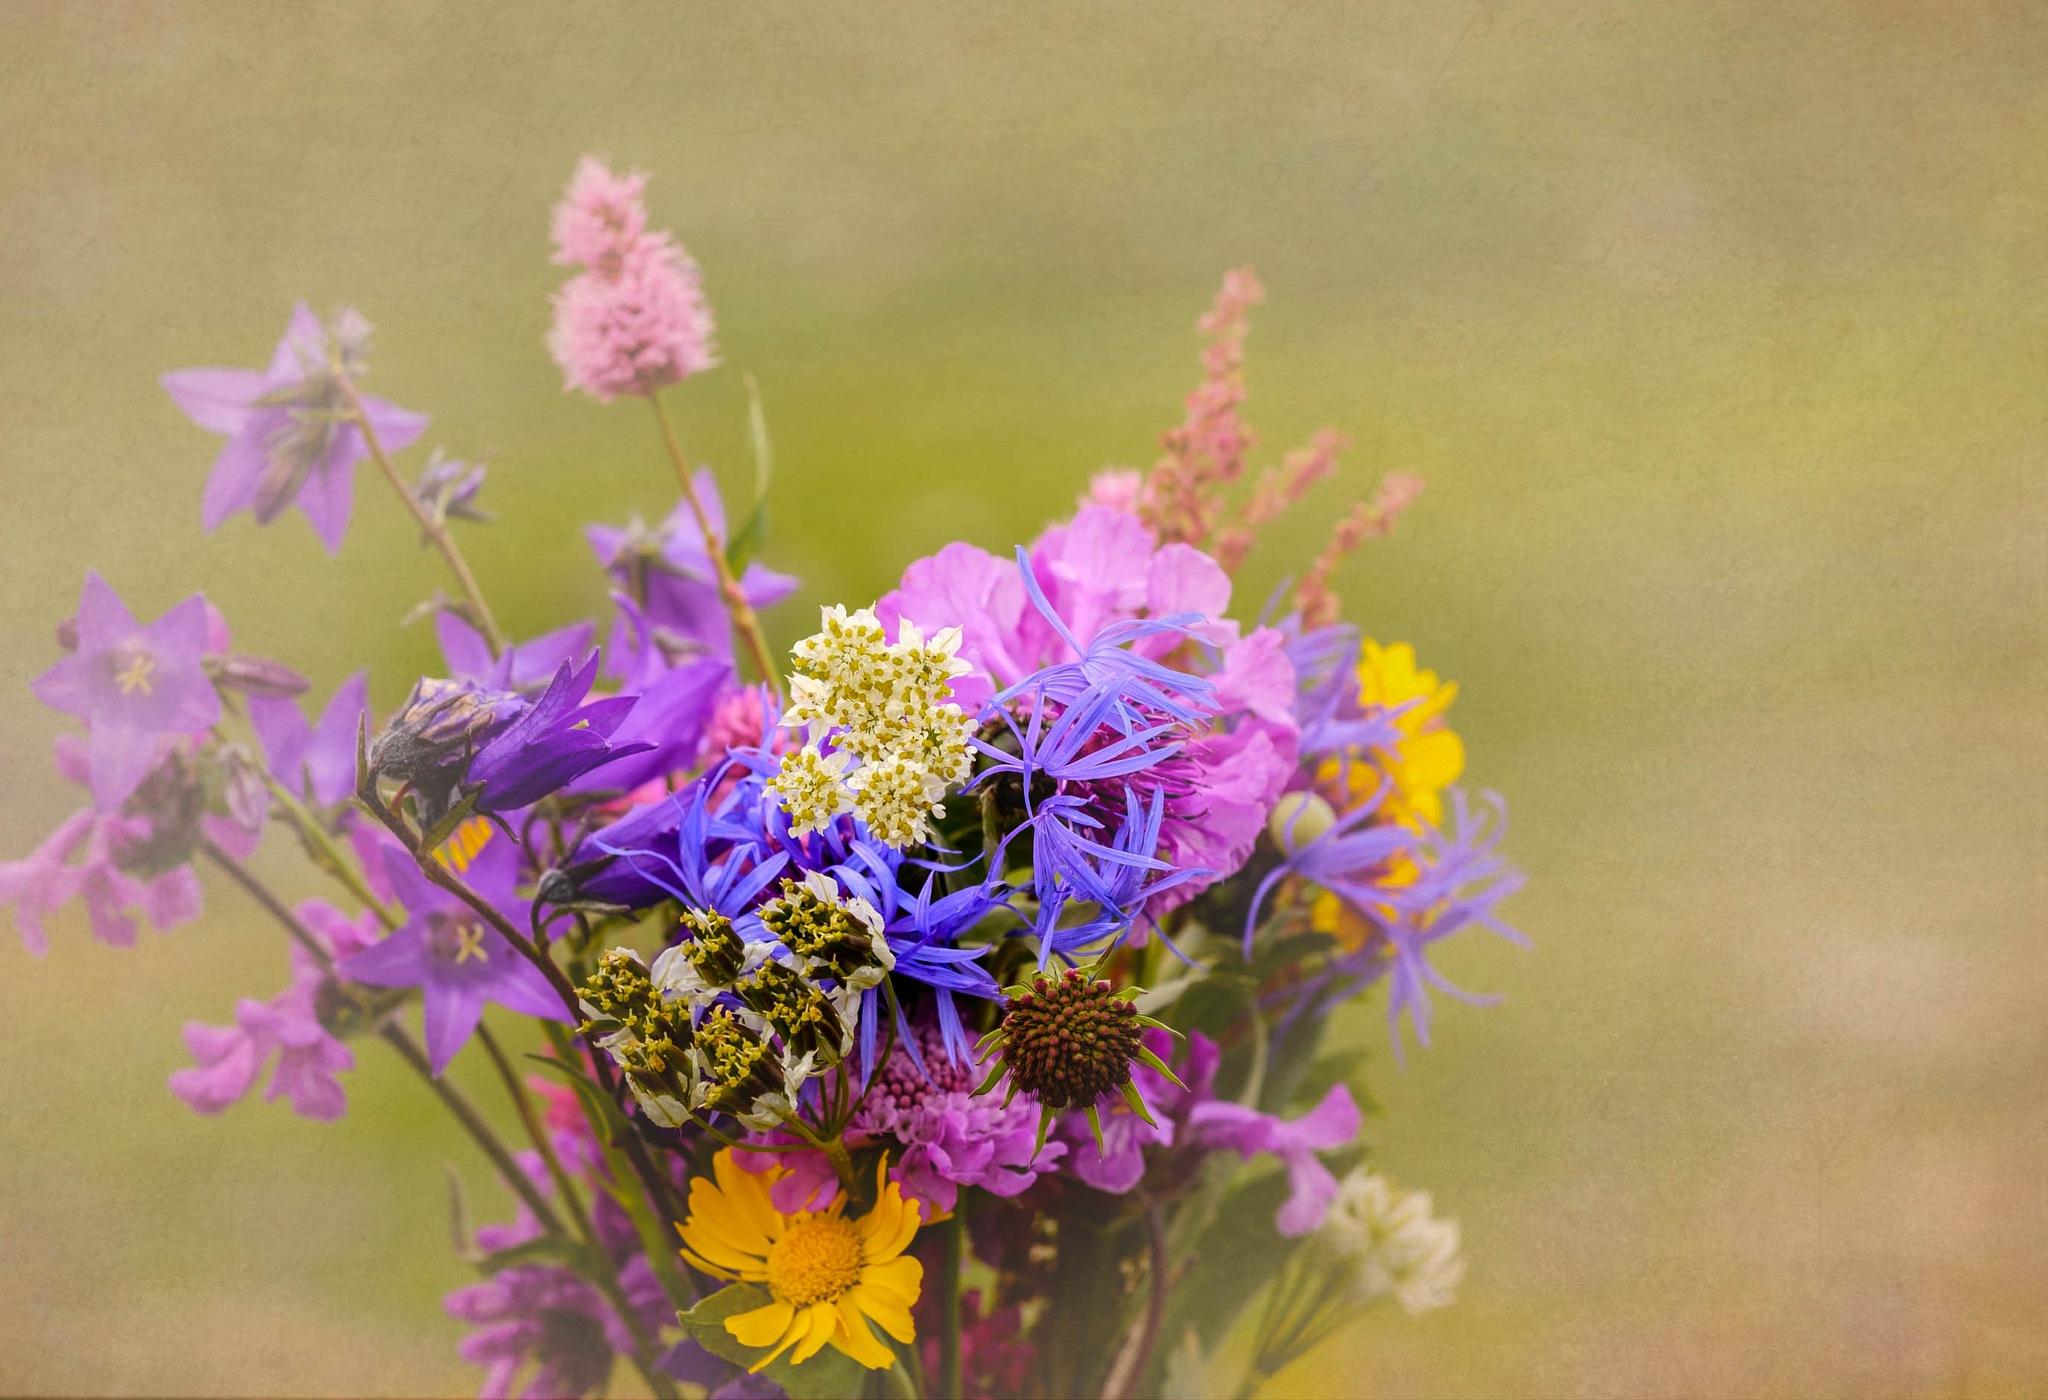 Flowers by cenk sarvan